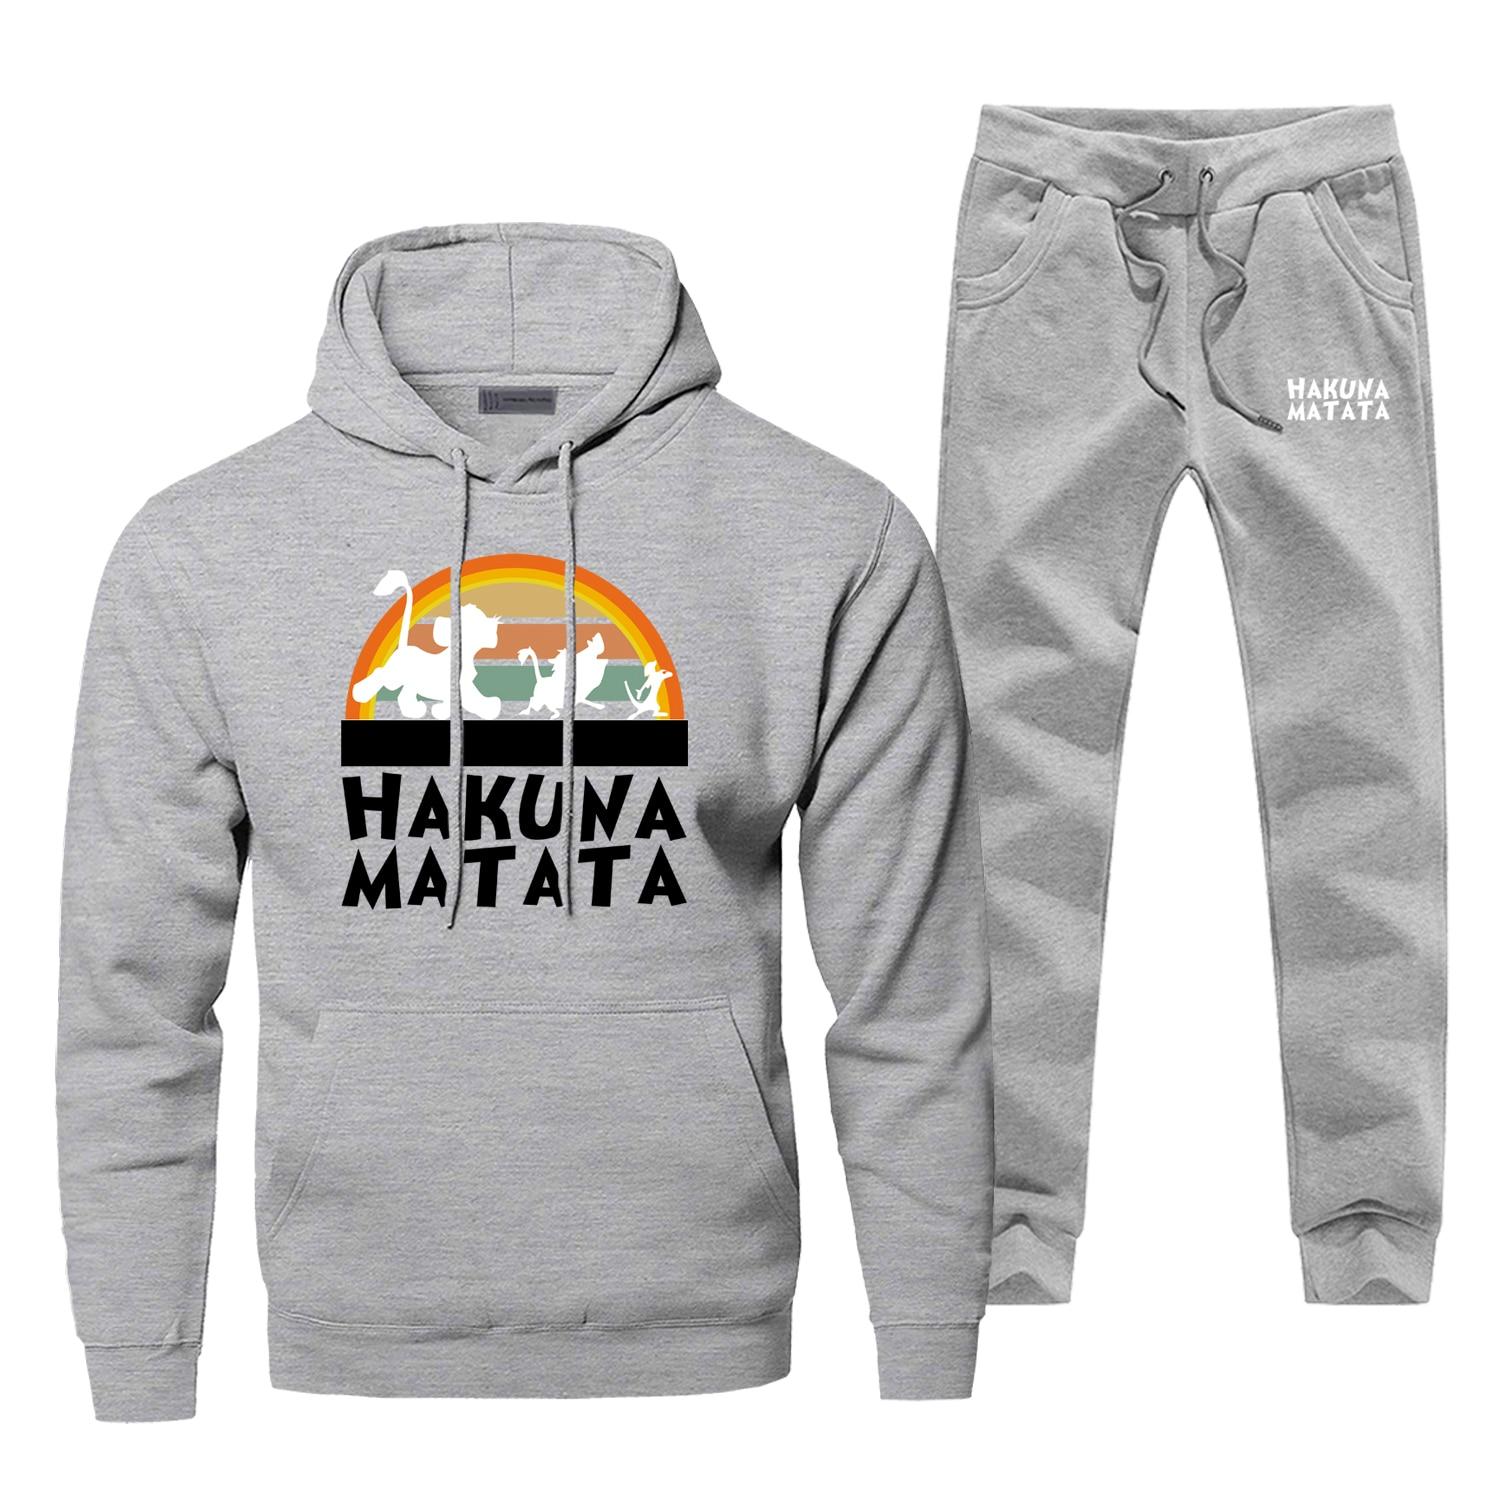 Hakuna Matata Cartoon Movie Hoodies The Lion King Men Hoodies Sweatshirts Pants Sets Hoodie Suit Track 2 PCS Hoody Pullover Set